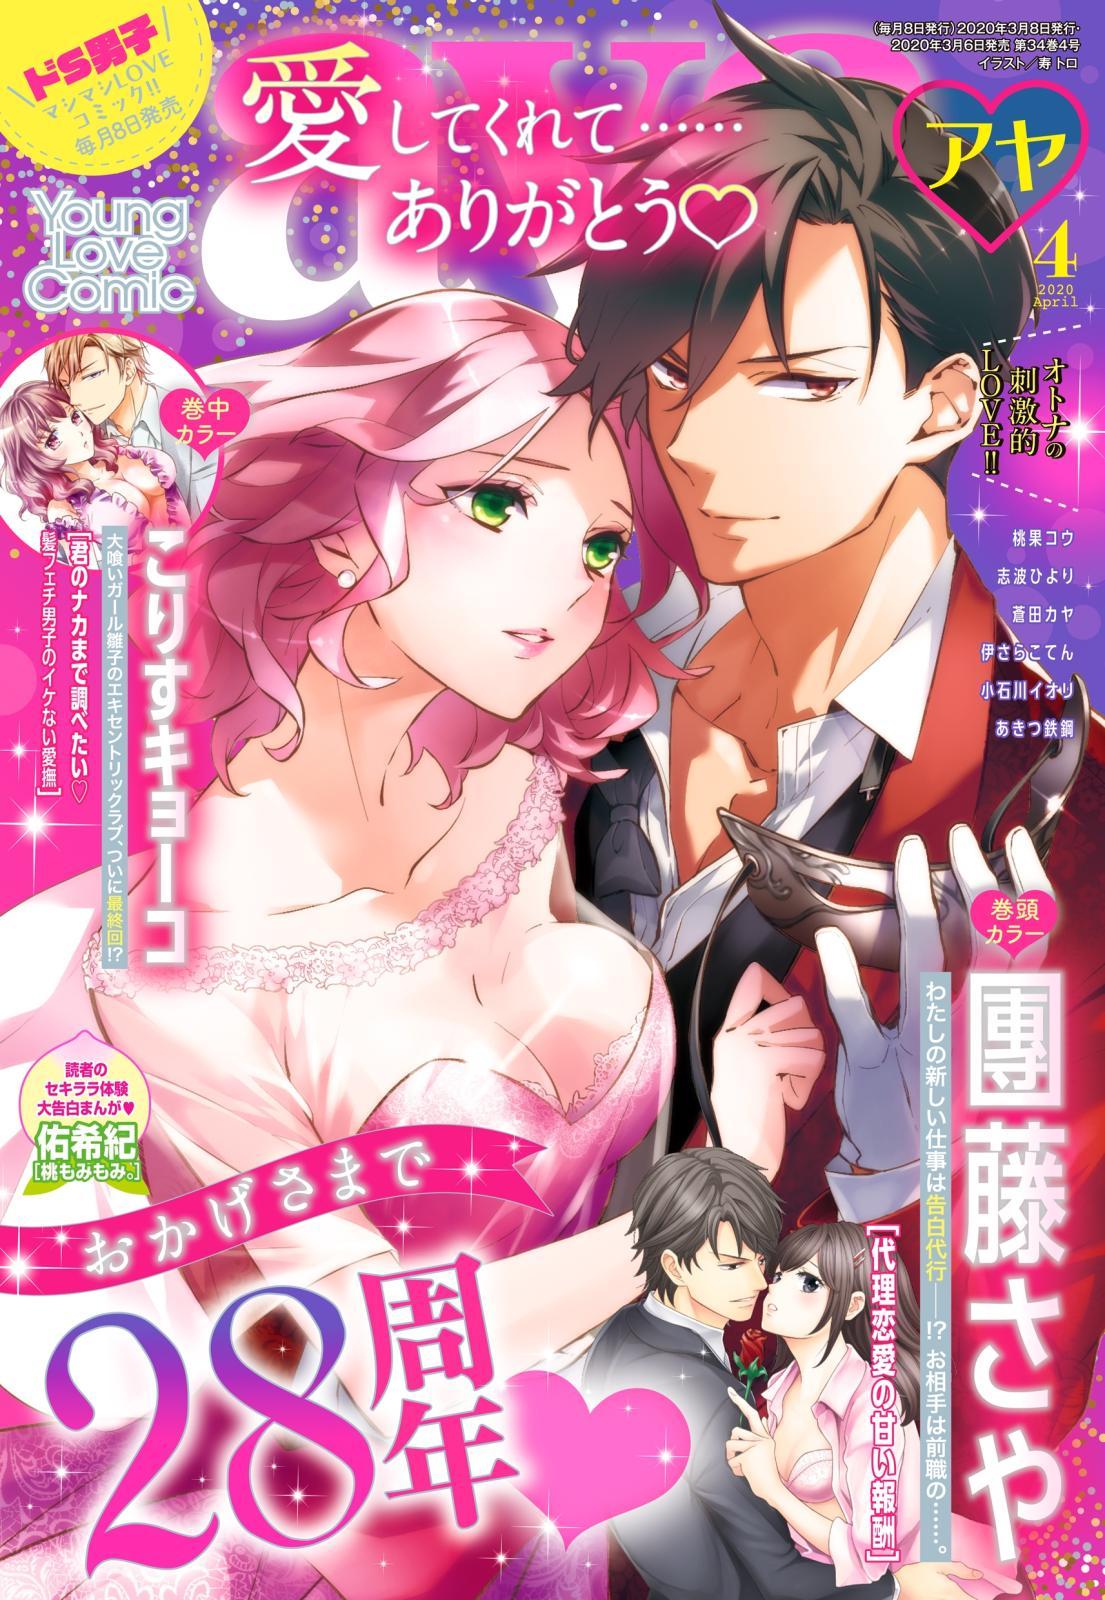 Young Love Comic aya2020年4月号